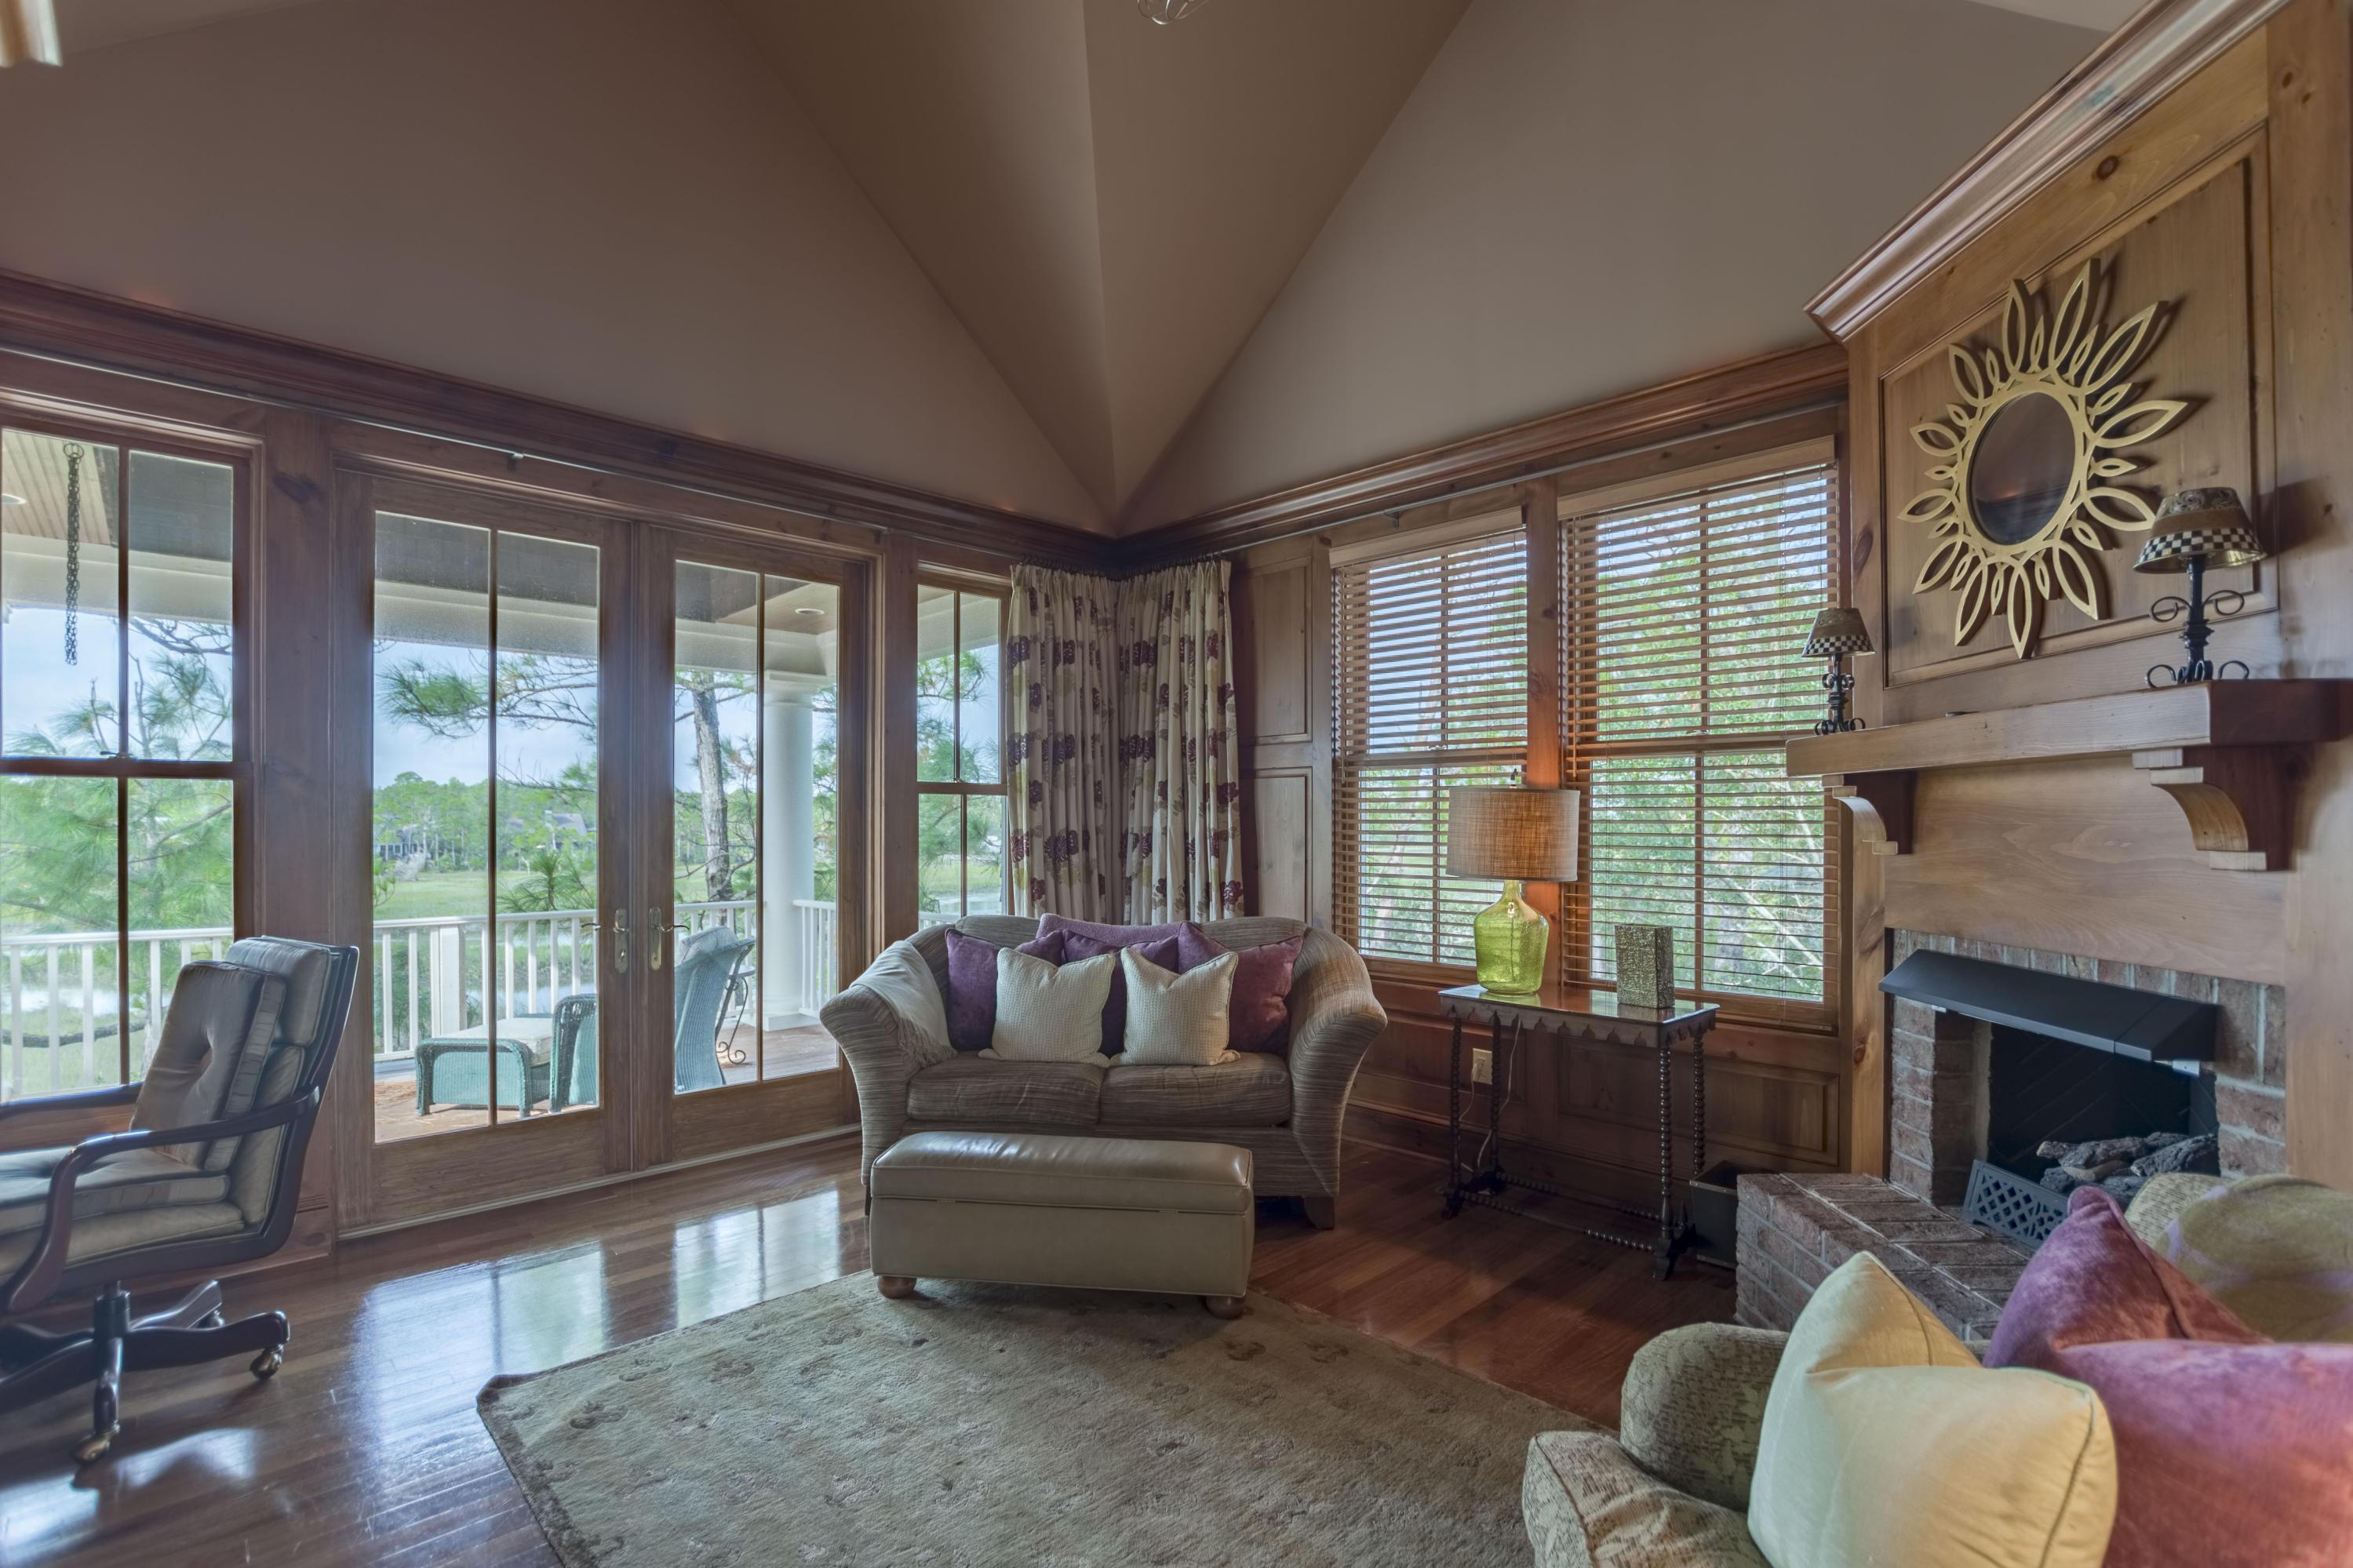 Kiawah Island Homes For Sale - 42 Salt Cedar, Kiawah Island, SC - 15